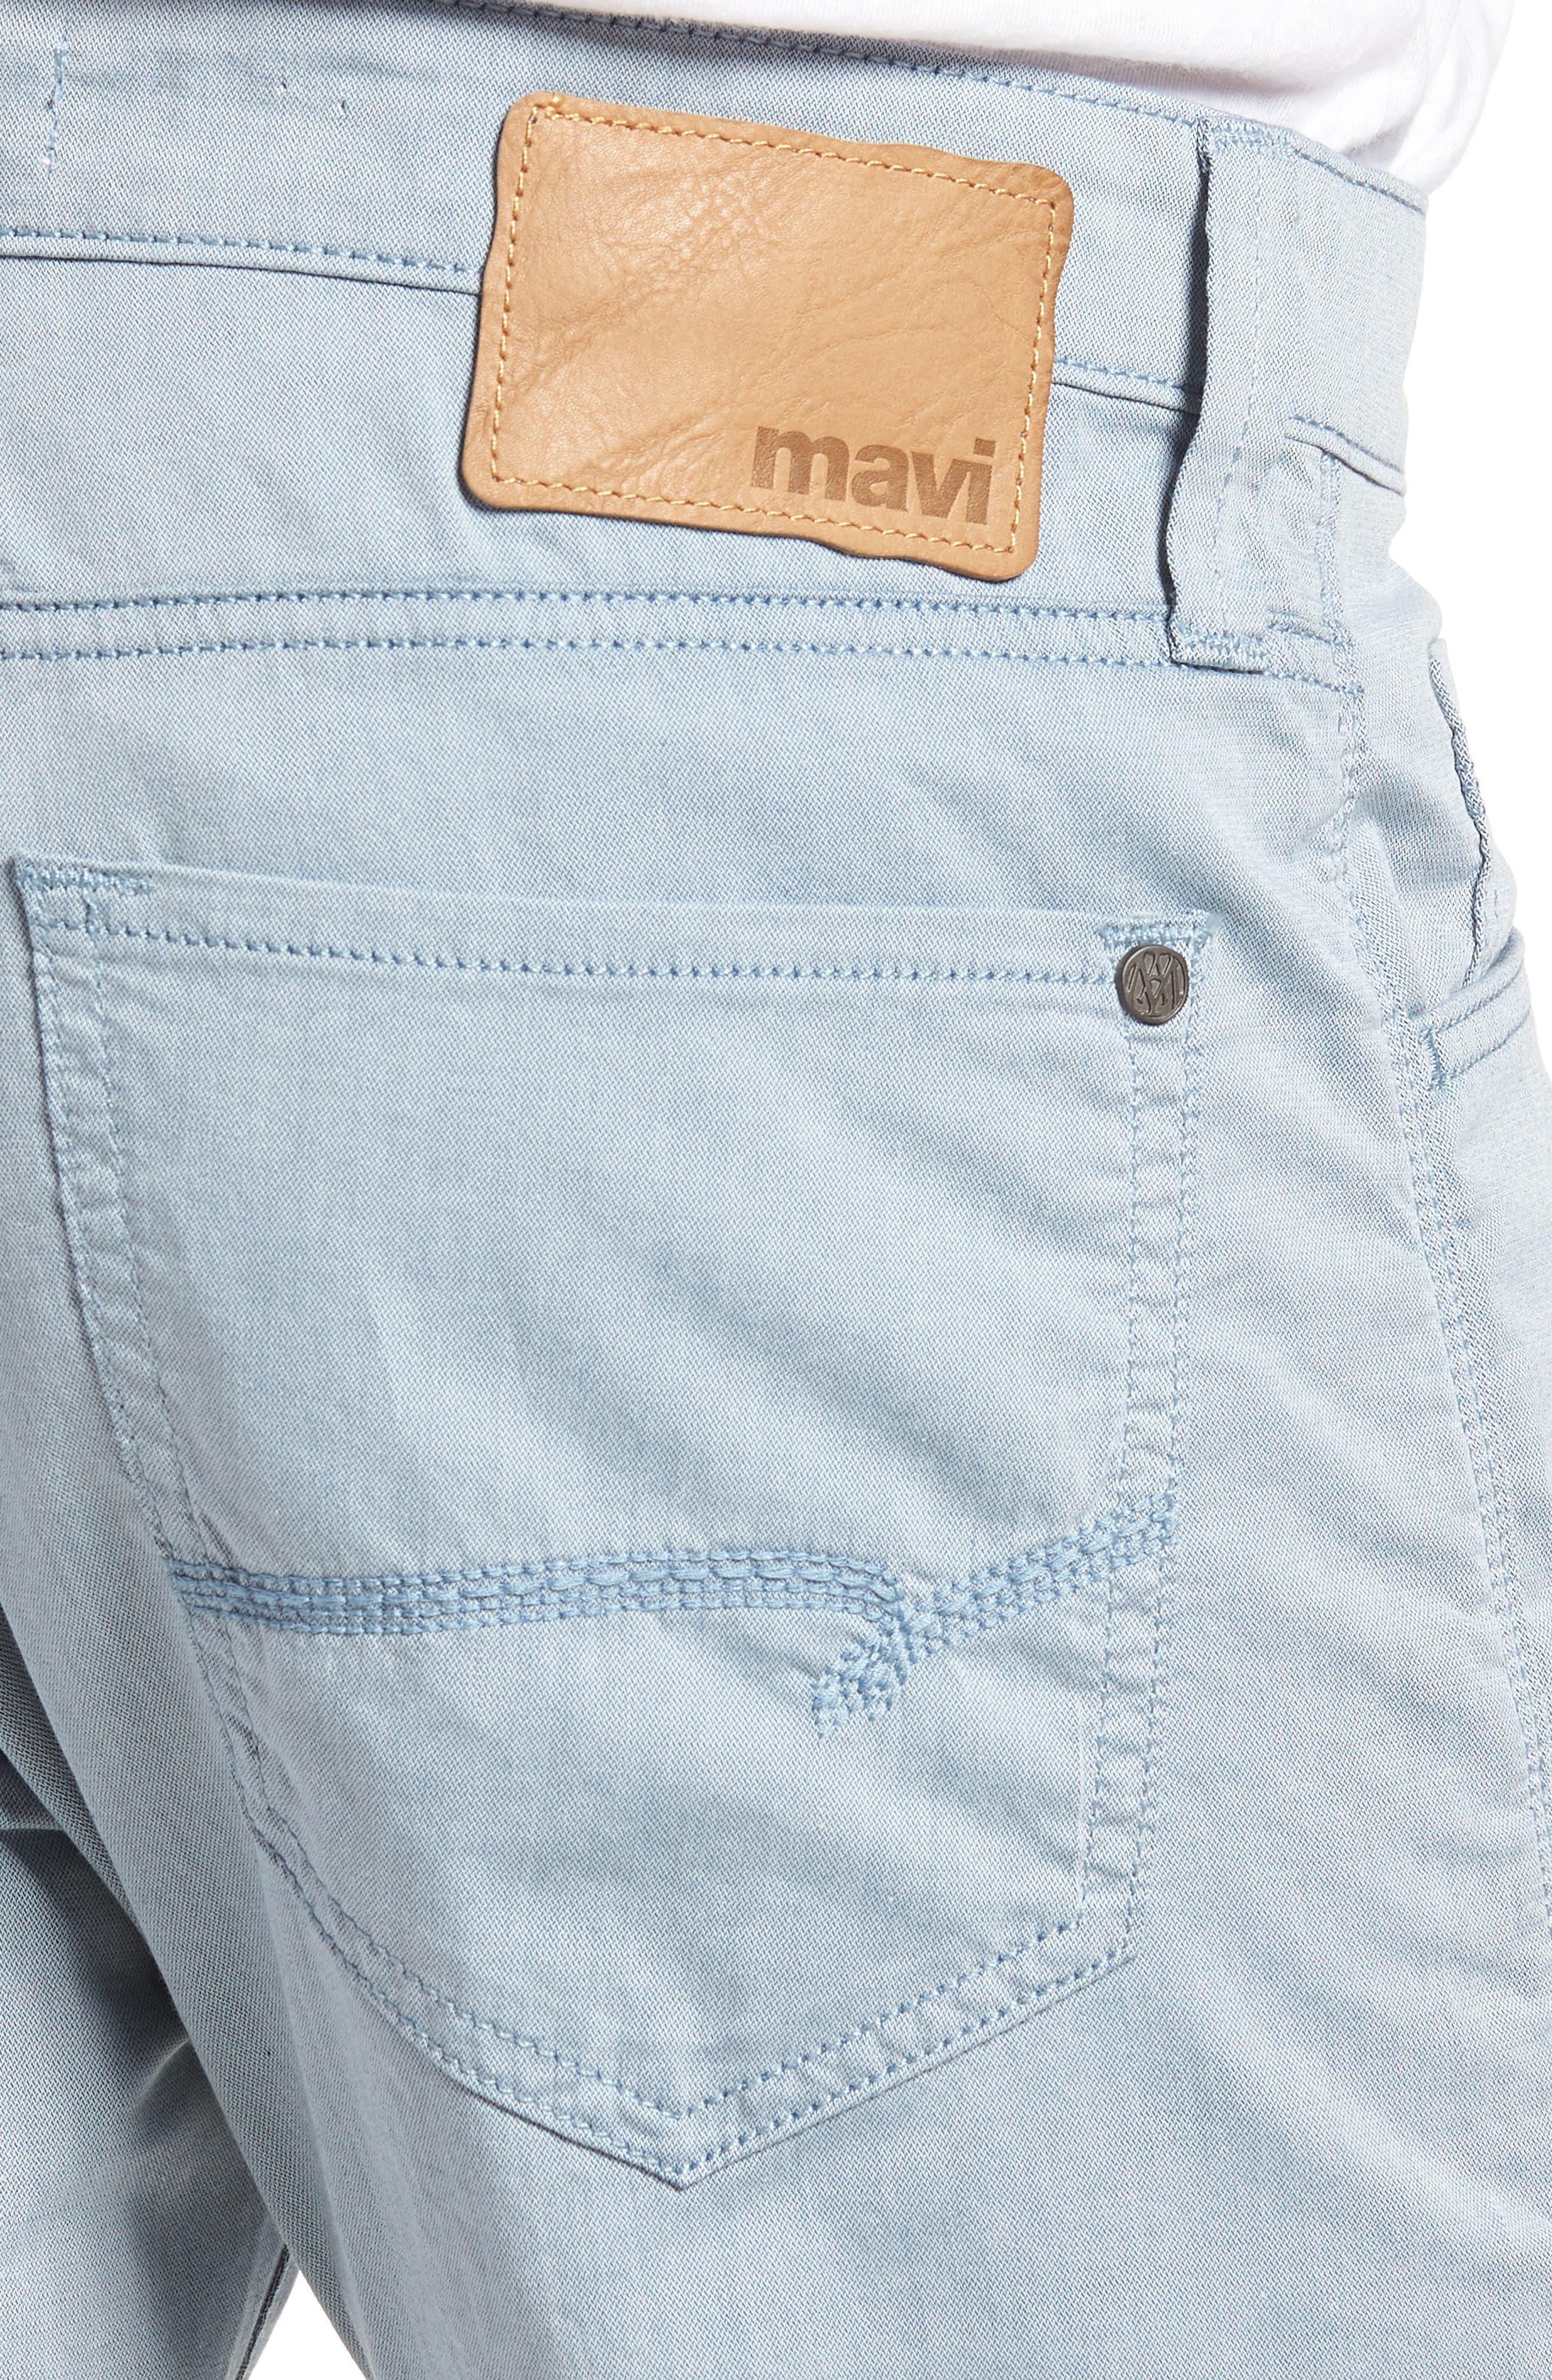 Jake Slim Fit Jeans,                             Alternate thumbnail 4, color,                             Blue Reversed